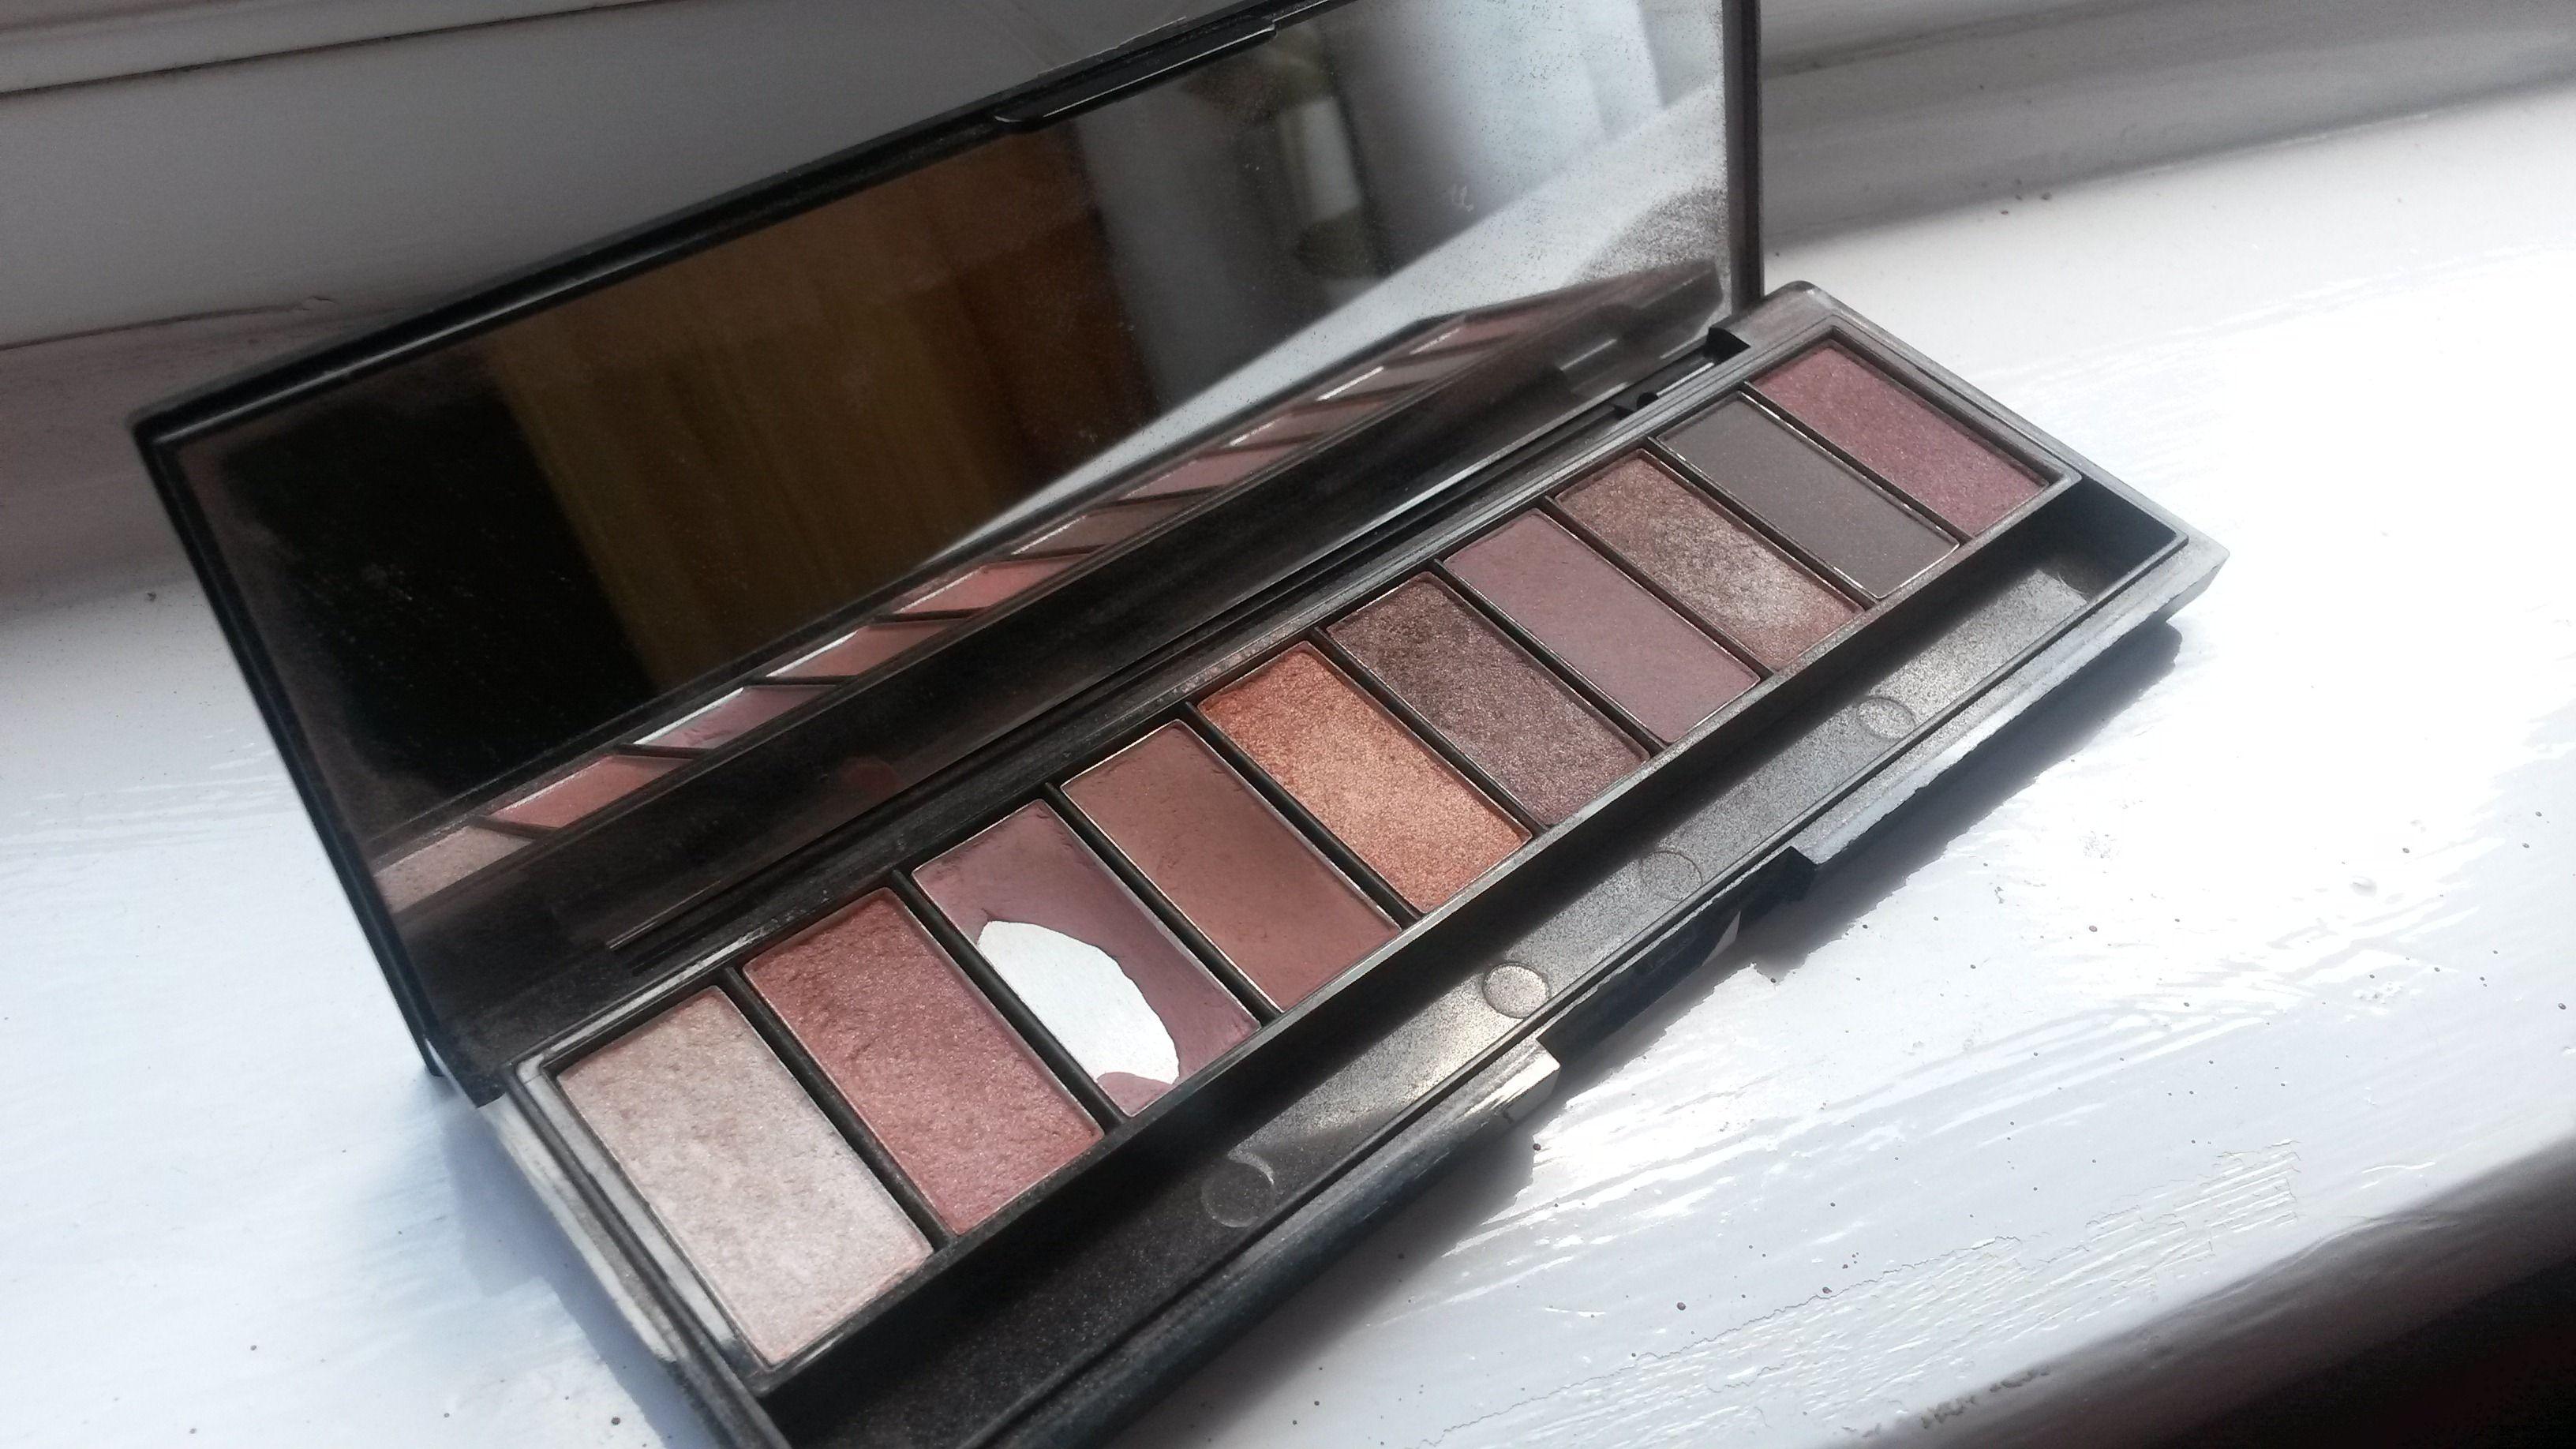 L'Oral Paris La Palette Nude Eyeshadow: Rose (Guess my most used shadow!)